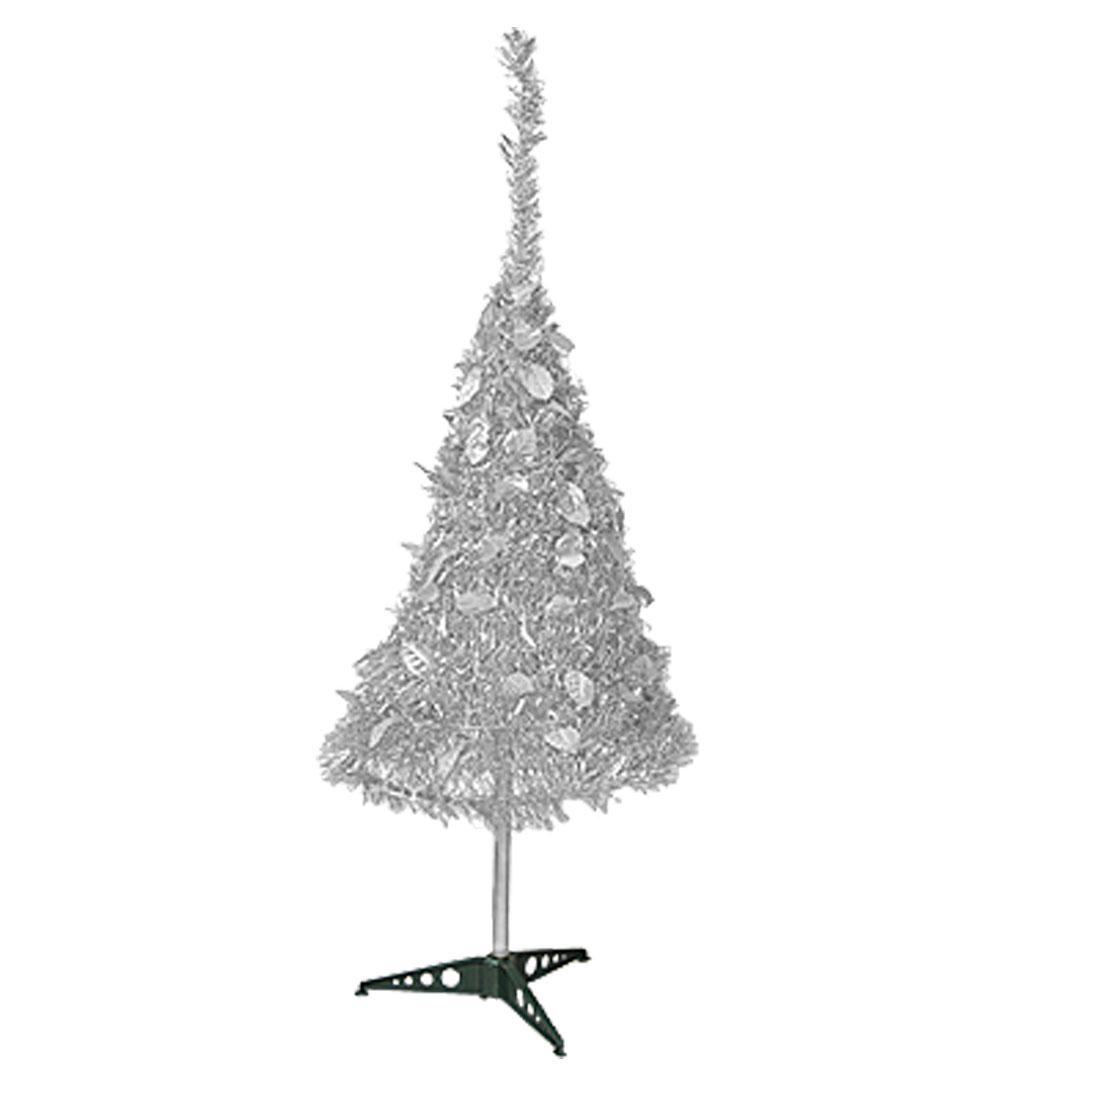 Silver Tone Tinsel Garland Foldable X'mas Christmas Tree